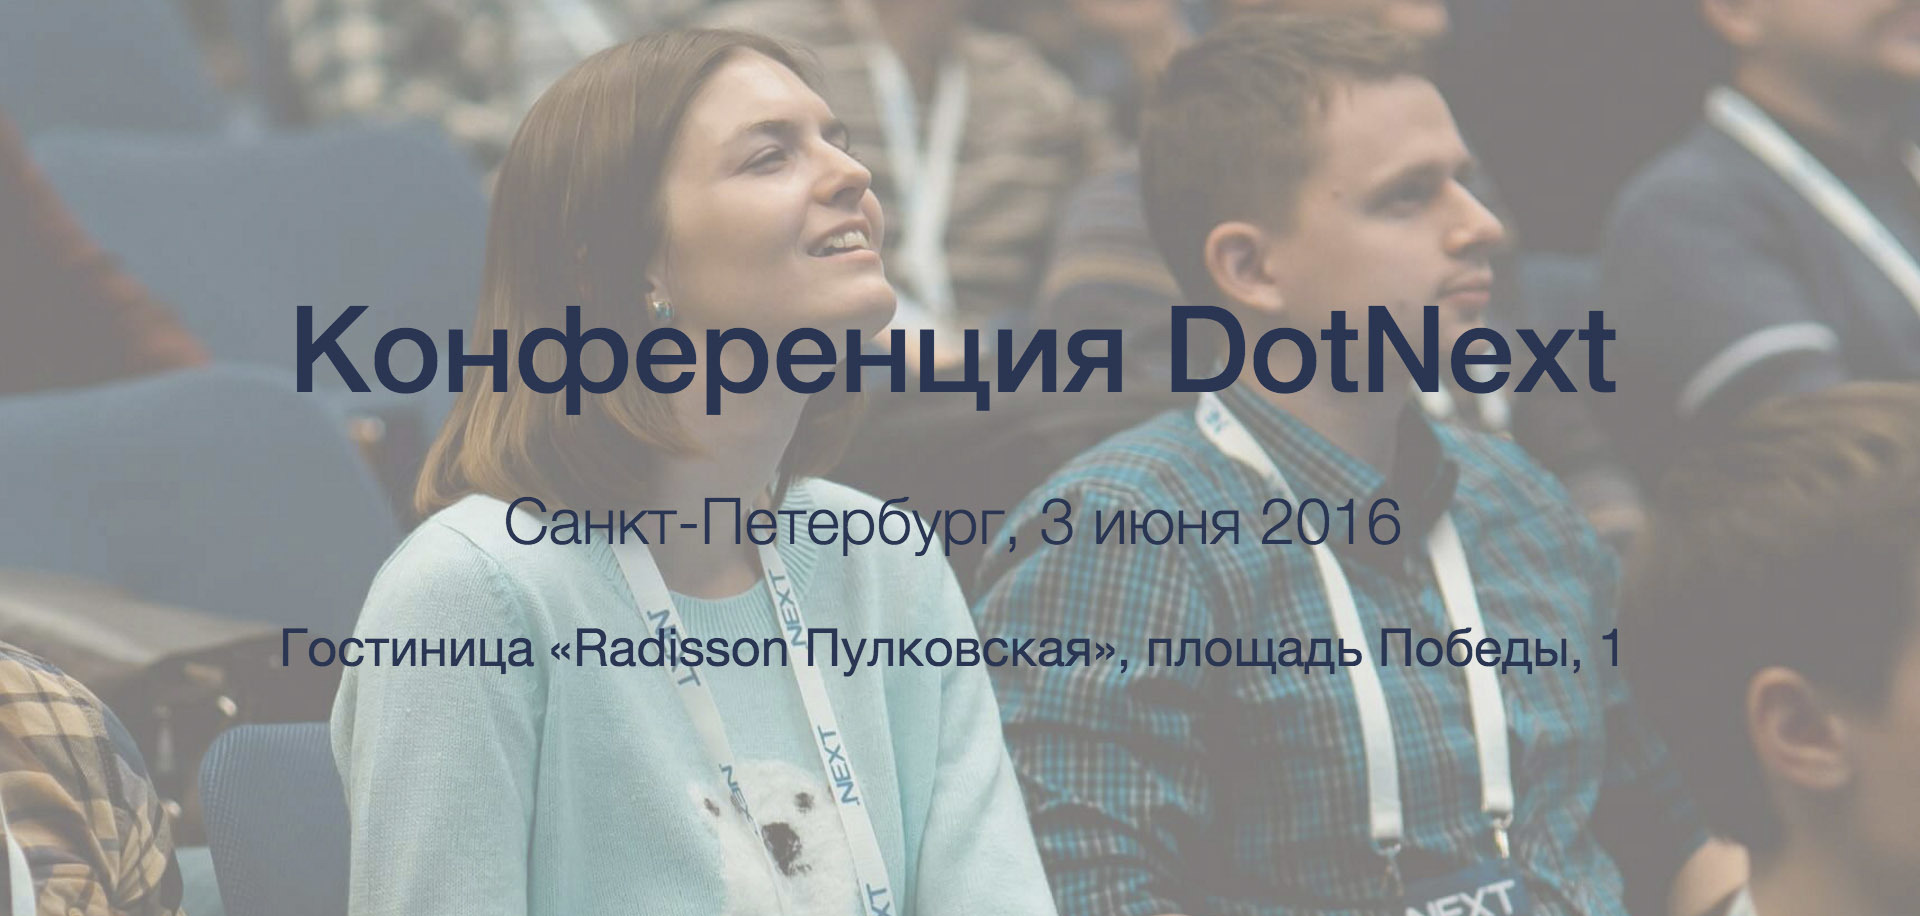 Анонс .NET-конференции DotNext 2016 Piter